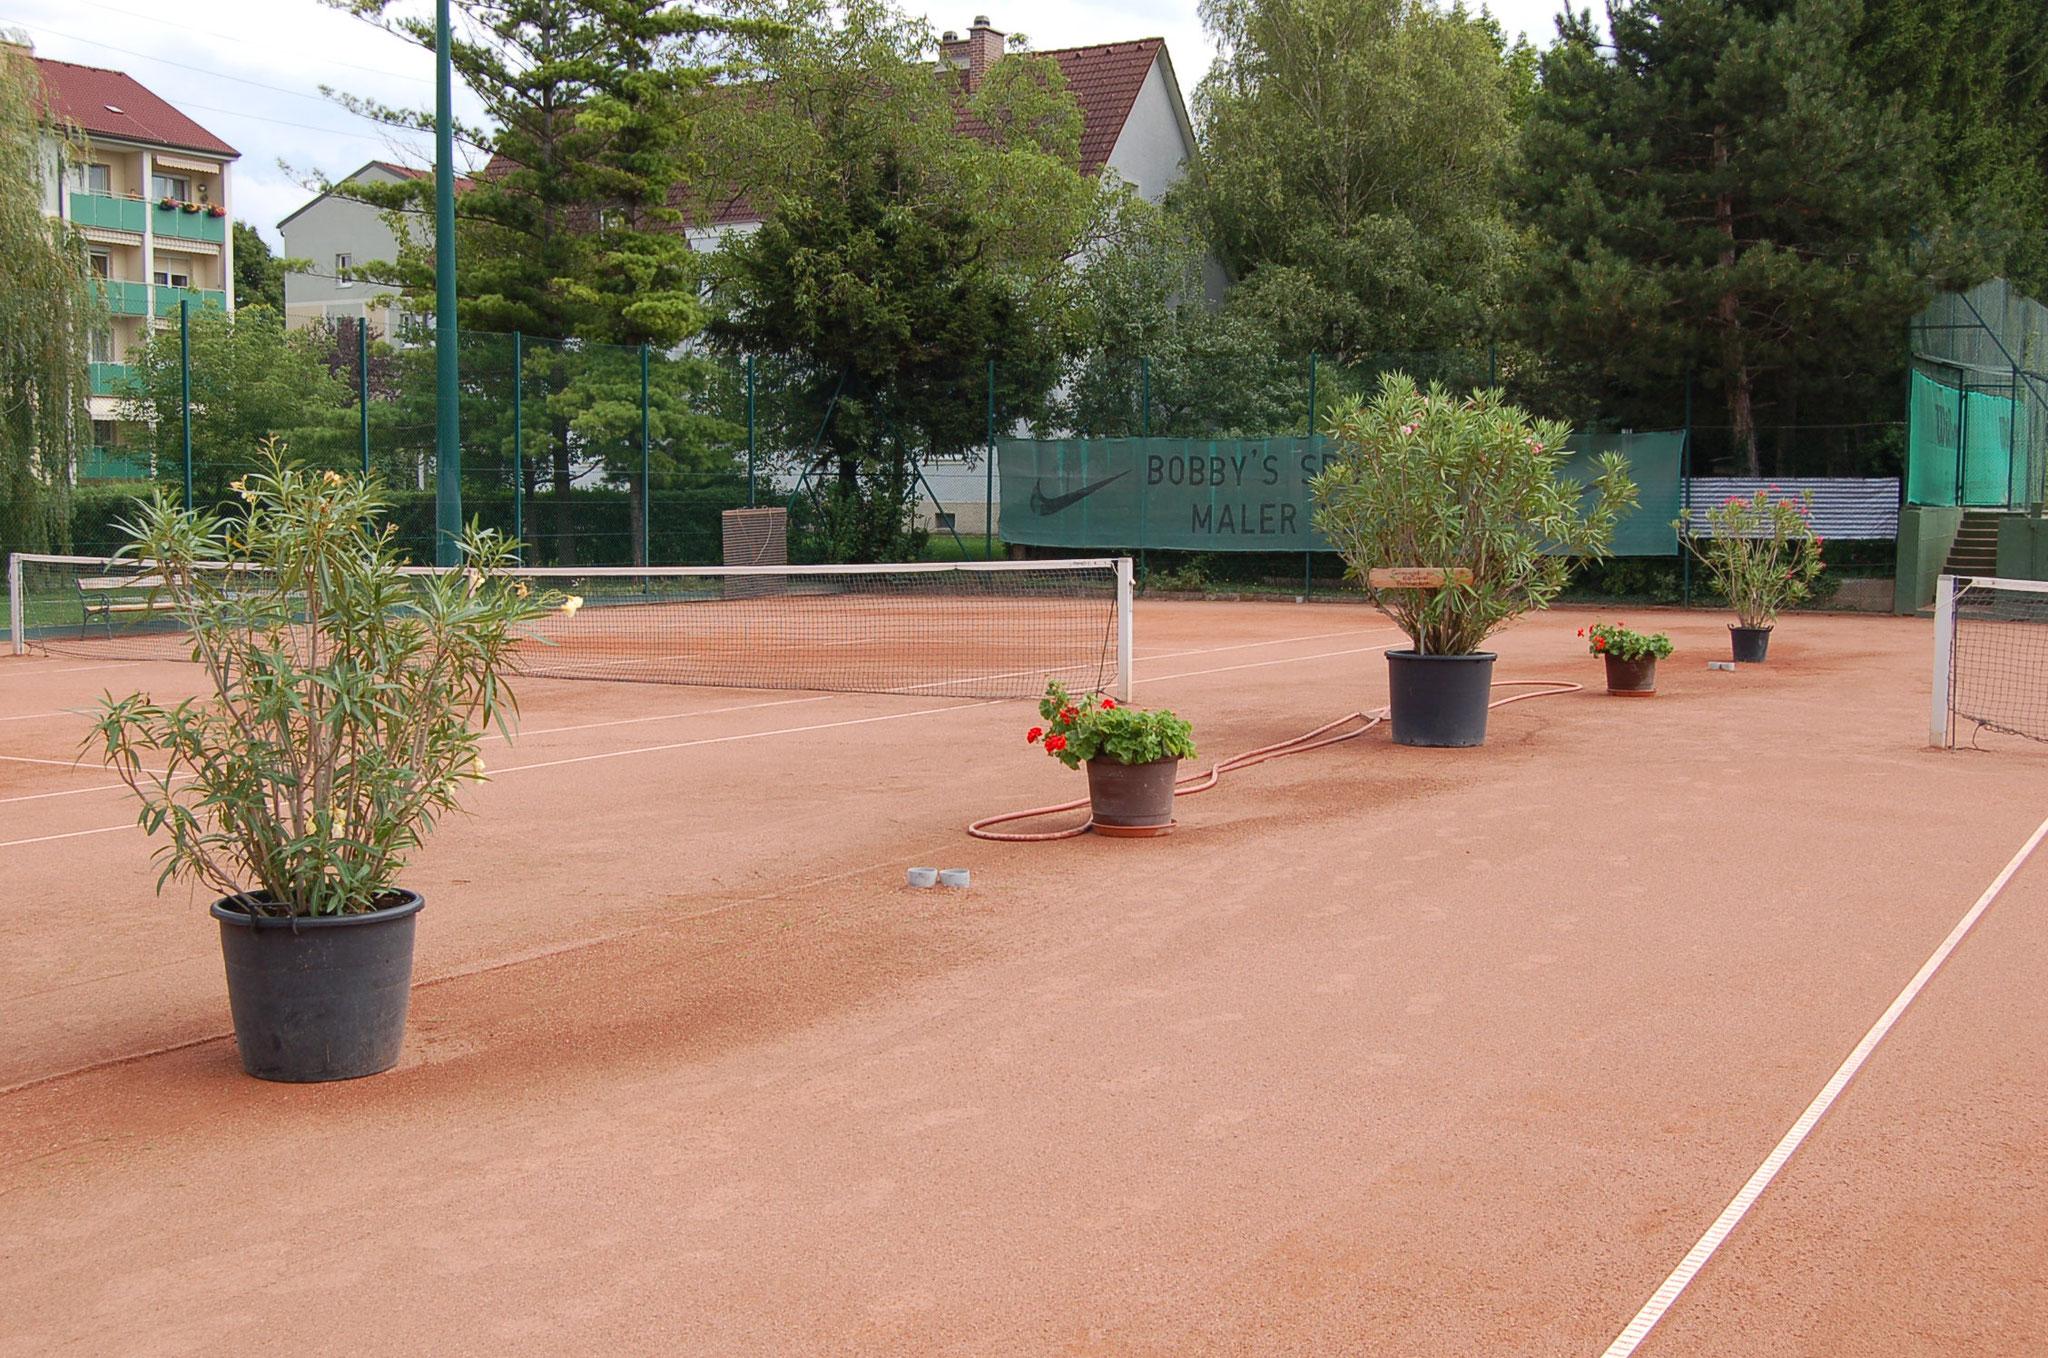 Tennisplätze in Enzesfeld